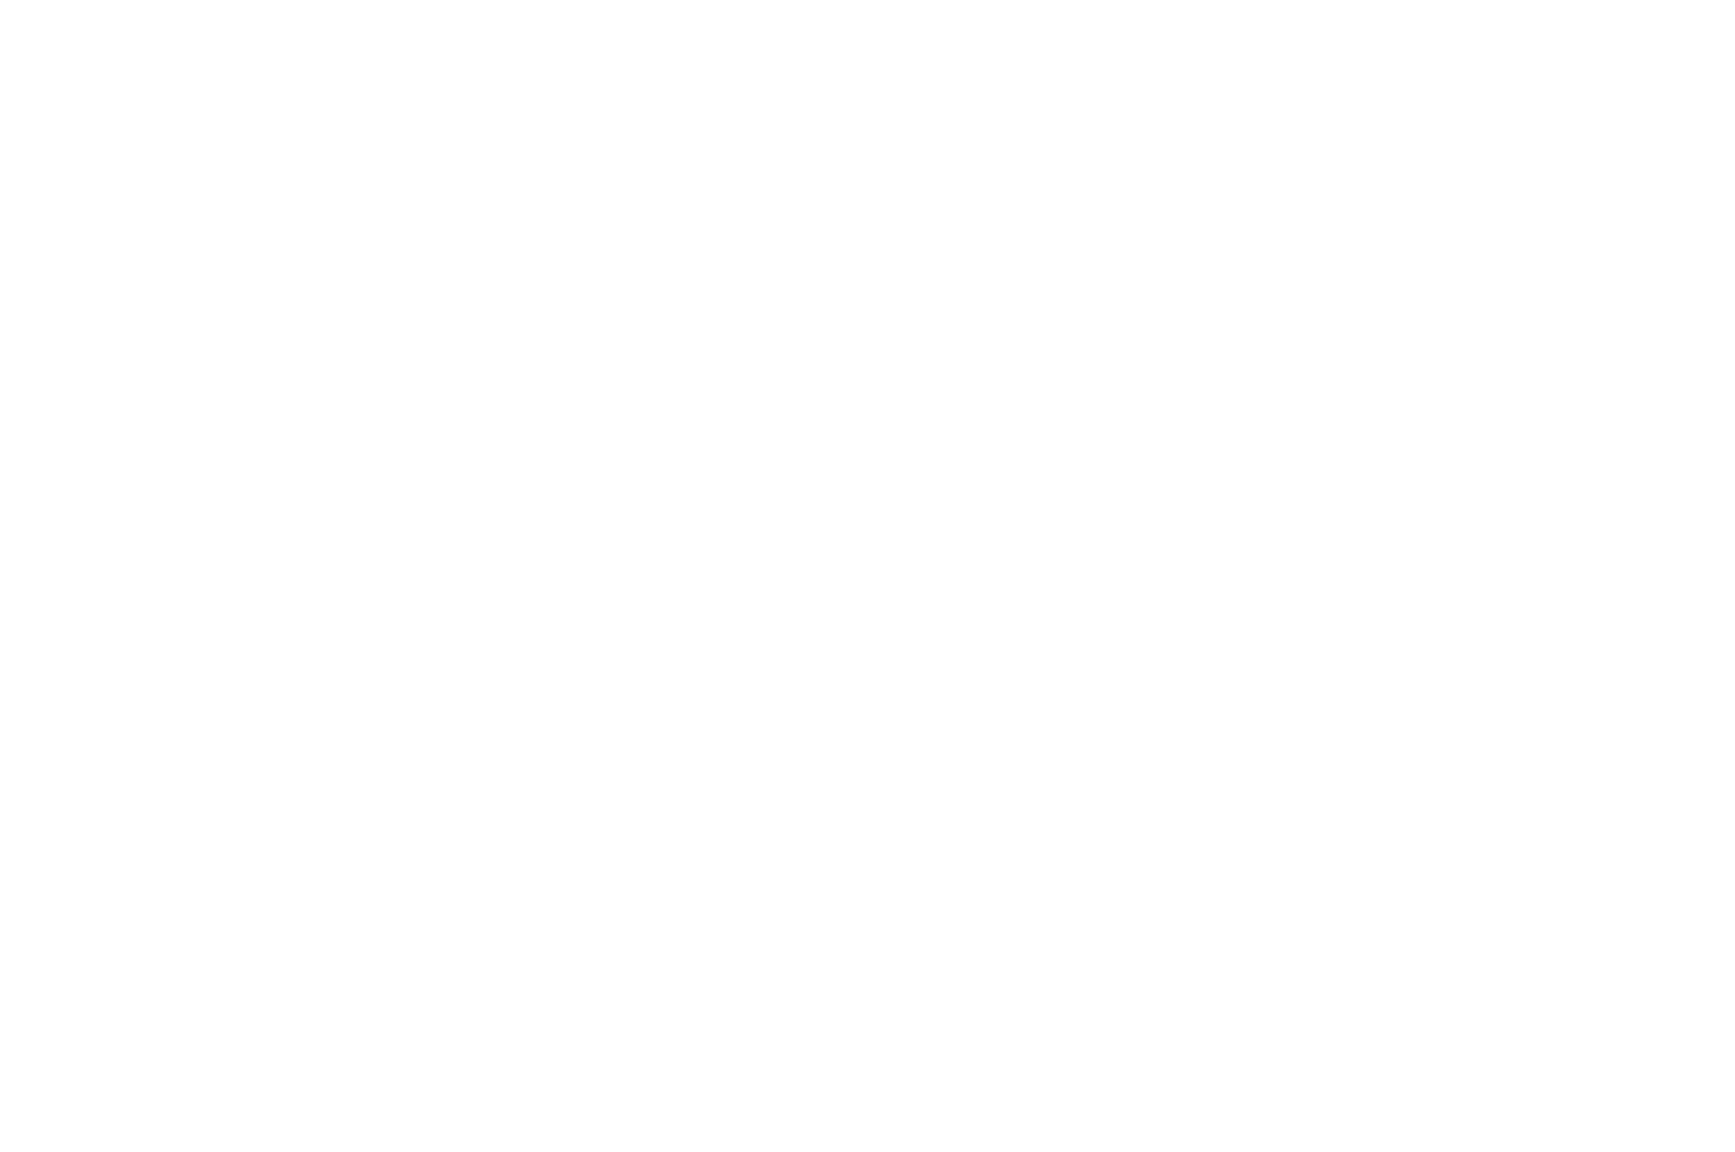 SEMI-FINALIST - 24th Annual Fade In Awards Horror Competition - 2020